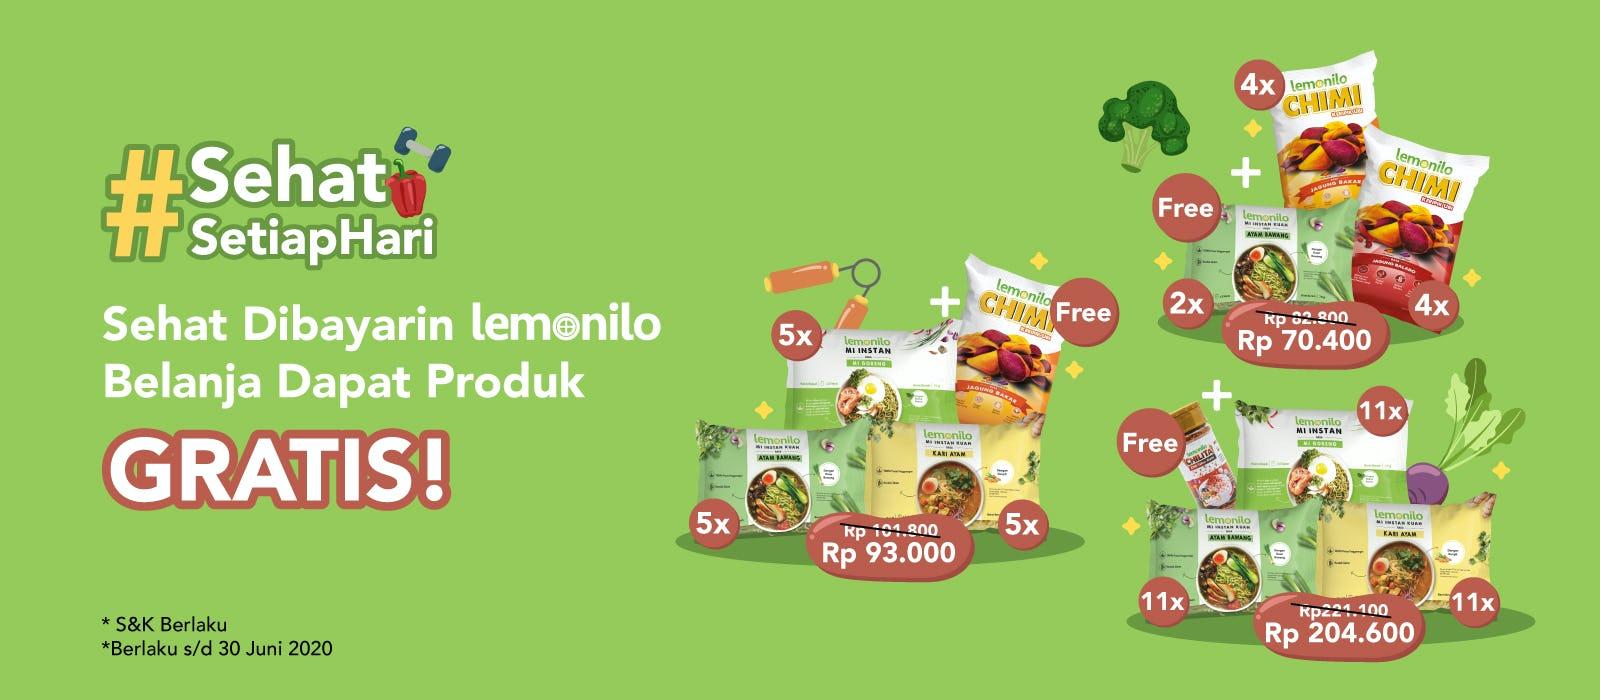 Sehat Dibayarin Lemonilo, Belanja Dapat Produk GRATIS!